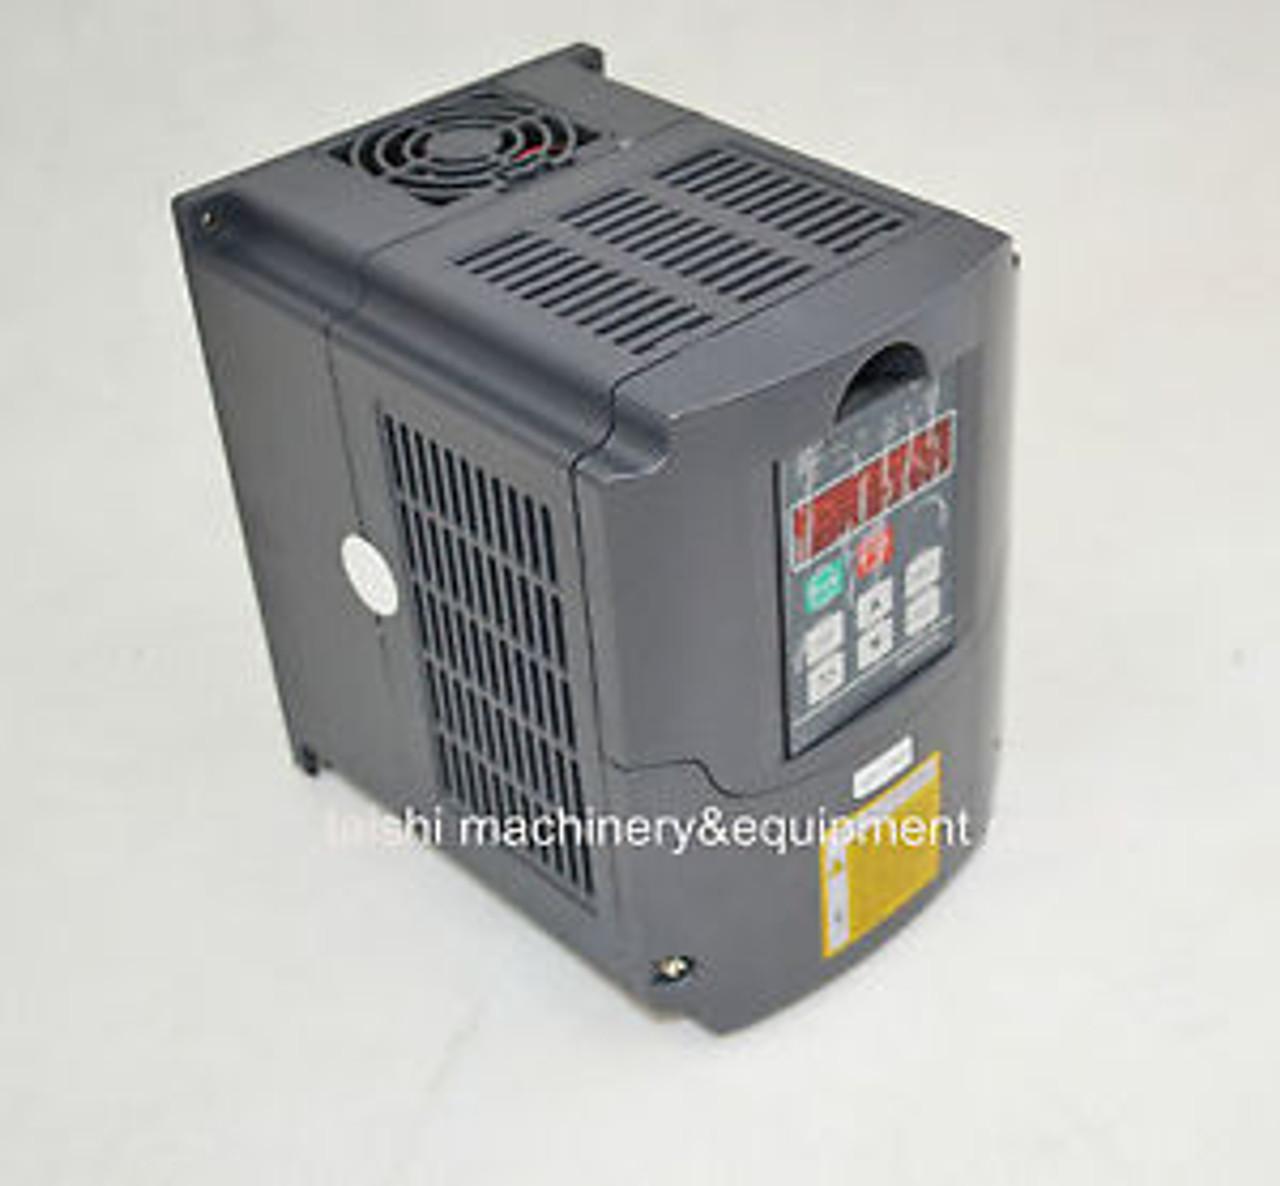 110v Huanyang Variable Frequency Drive Inverter Vfd 2 2kw High Quality